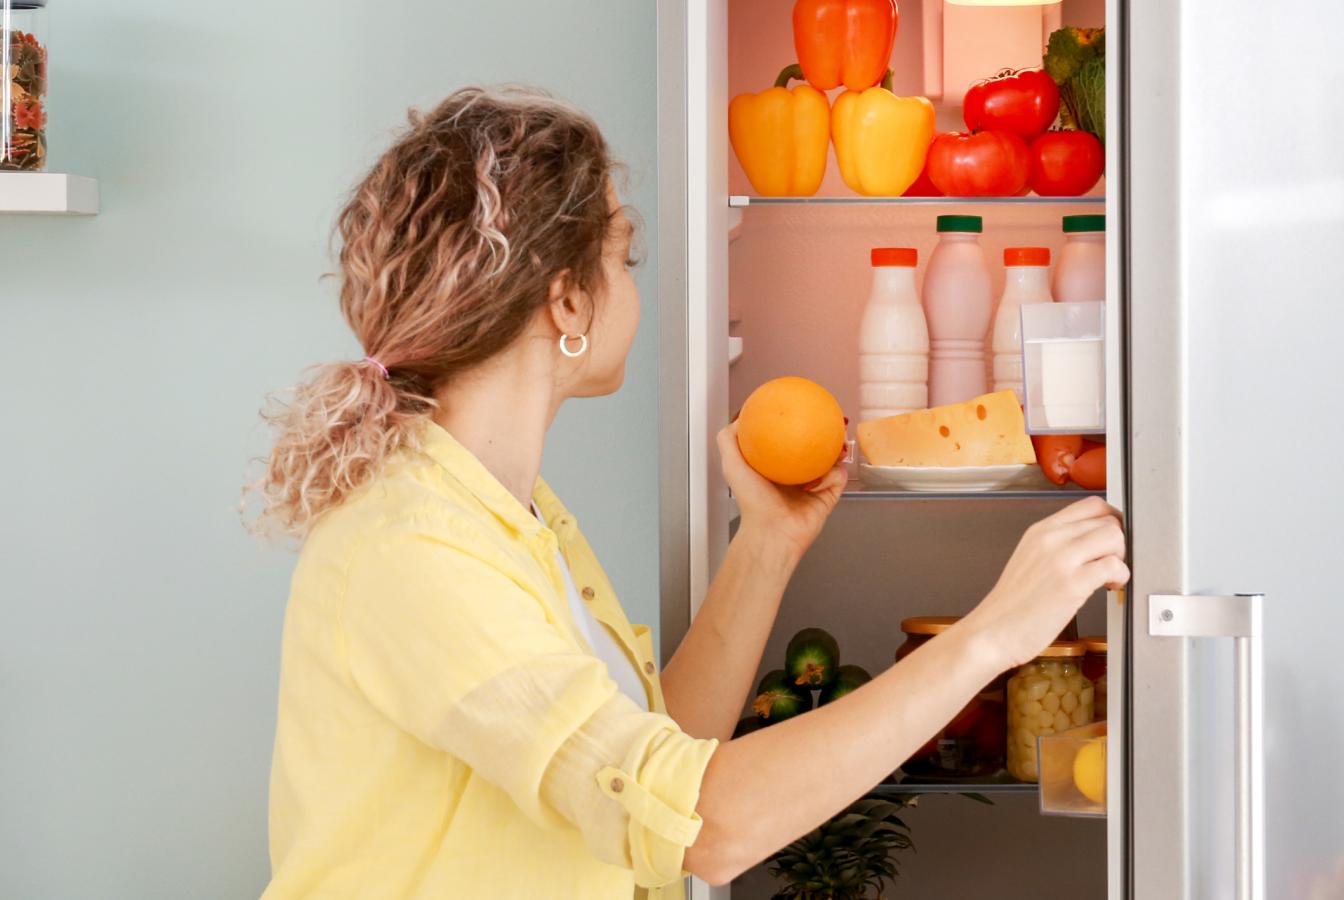 Woman opening fridge to retrive an orange